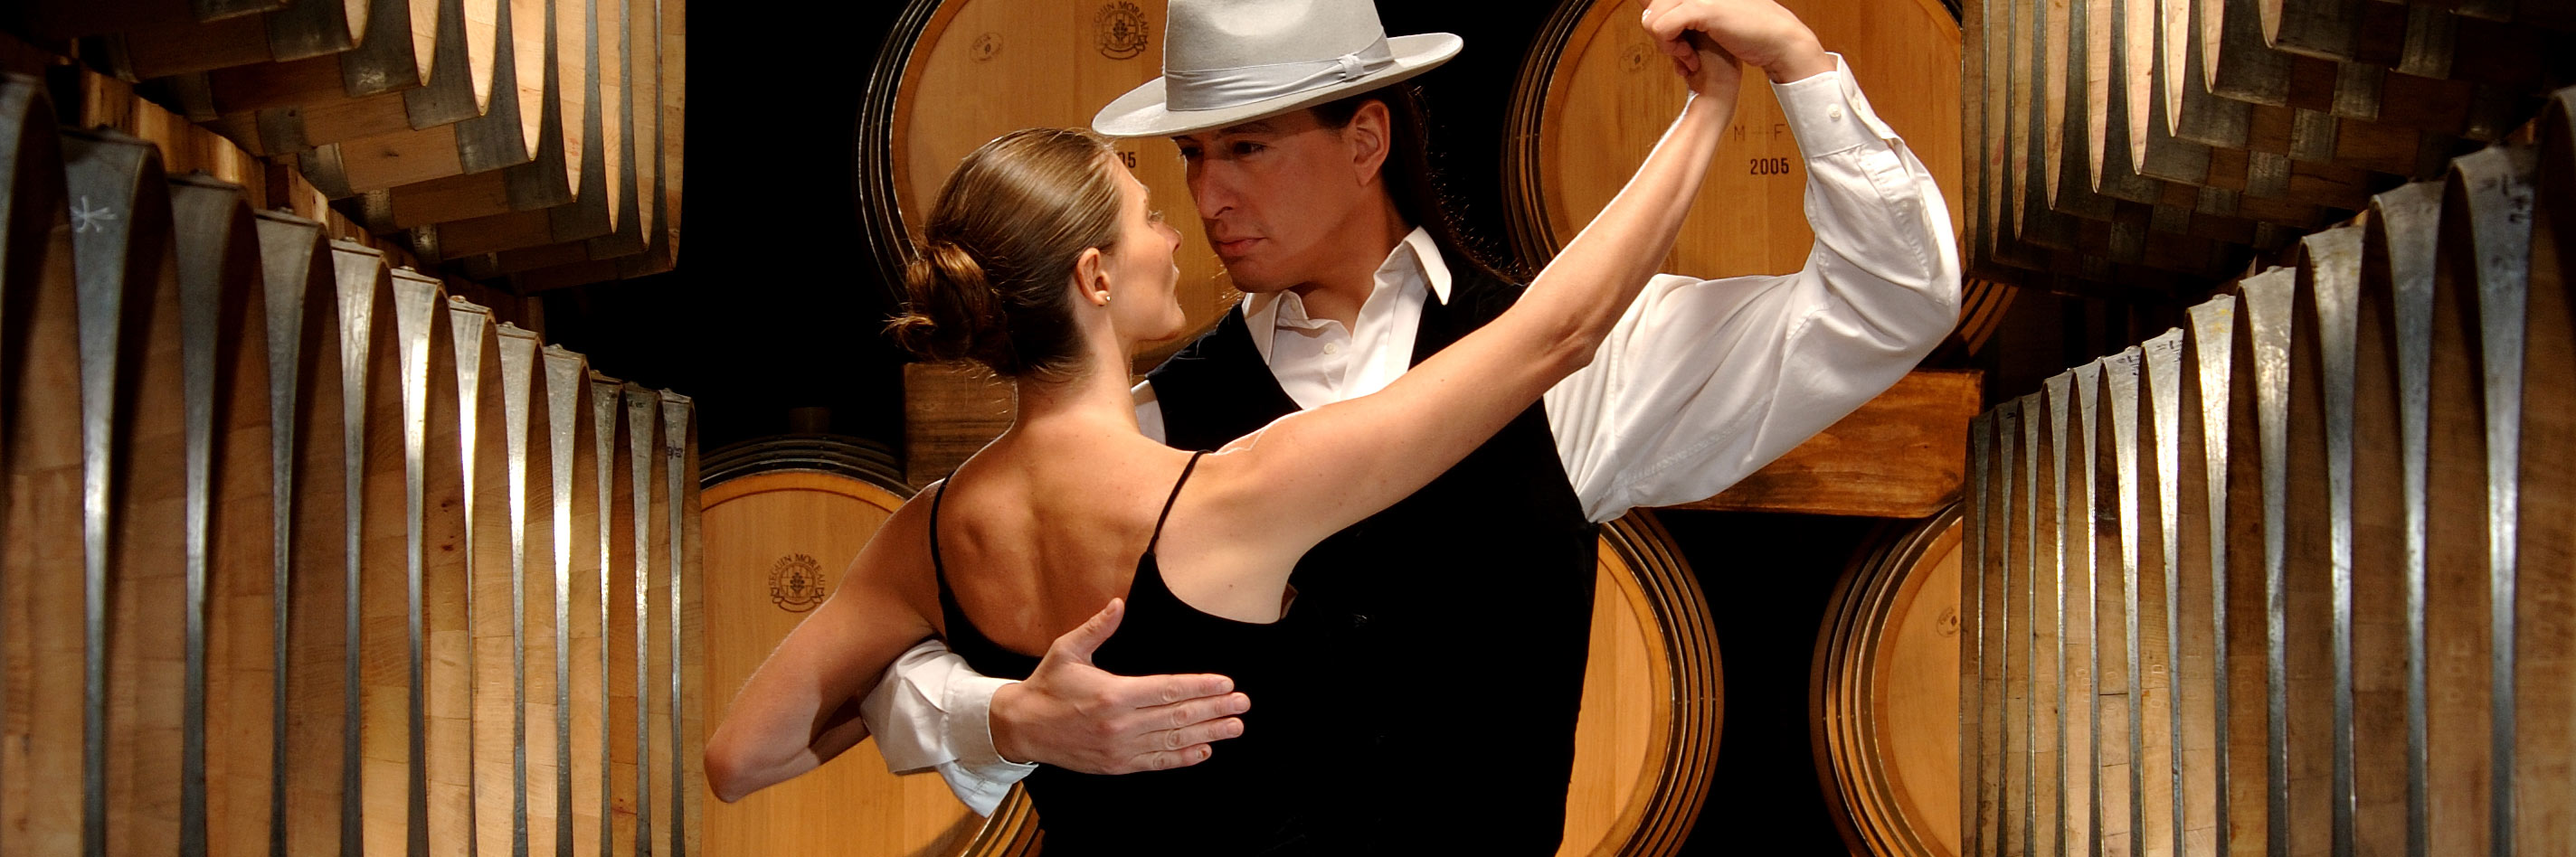 tango-dancers-winery-wofa